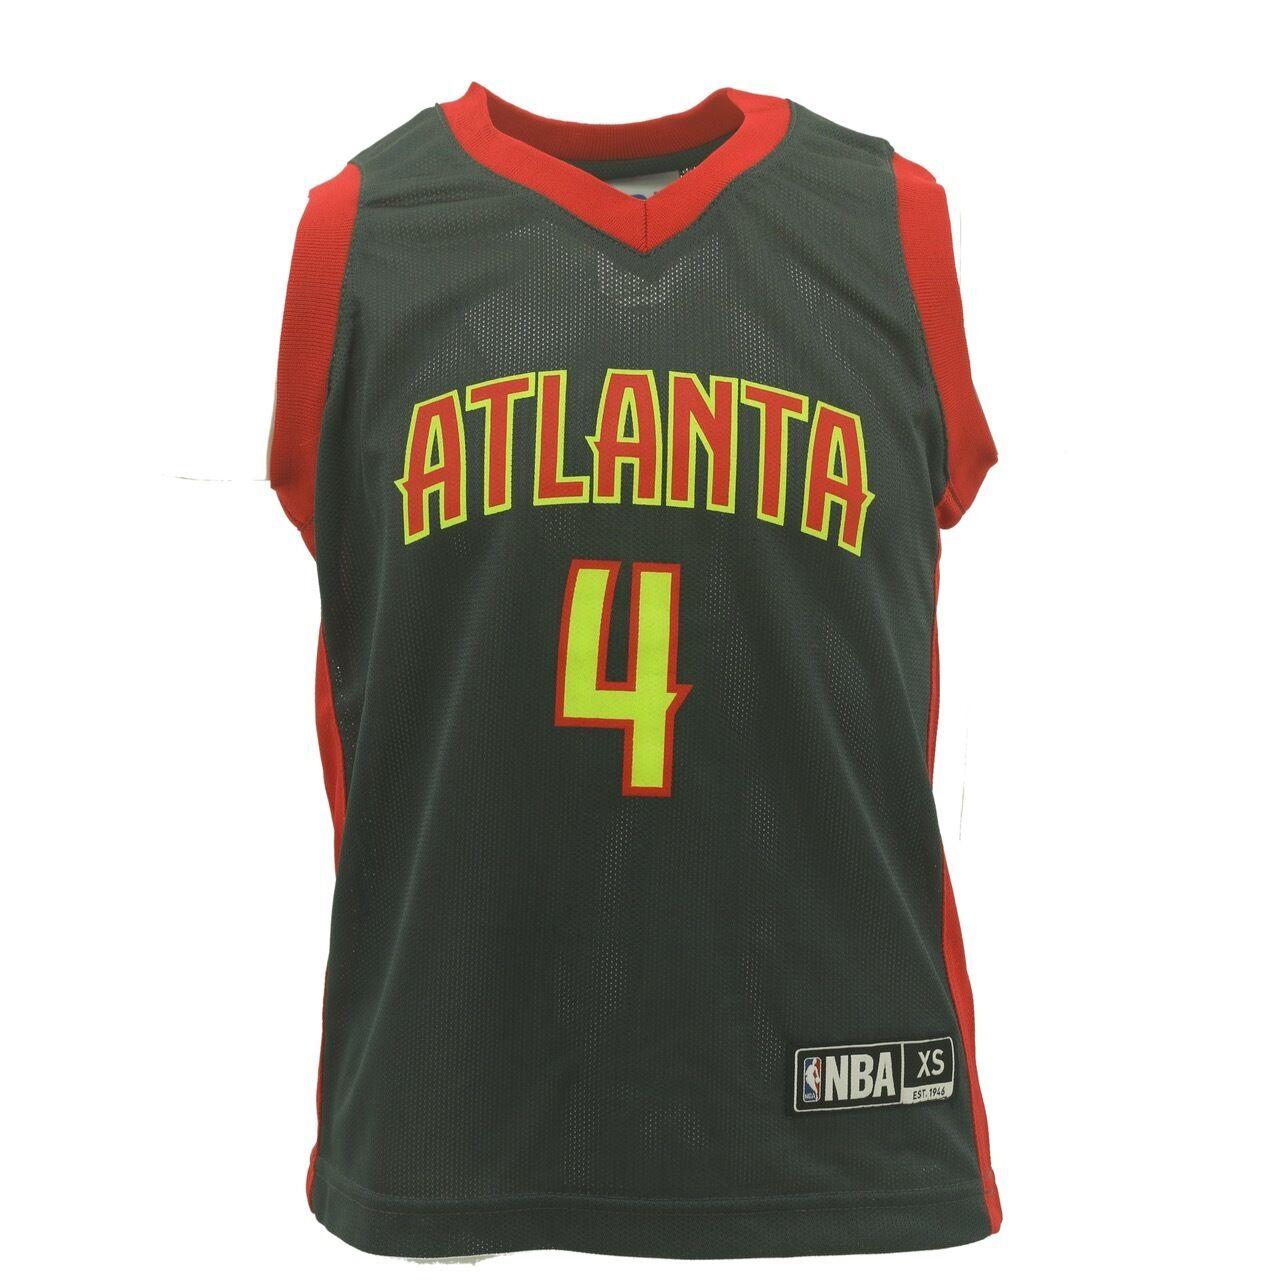 Atlanta Hawks Kids Youth Size Paul Millsap NBA Jersey New With Tags ... 38f5e6082